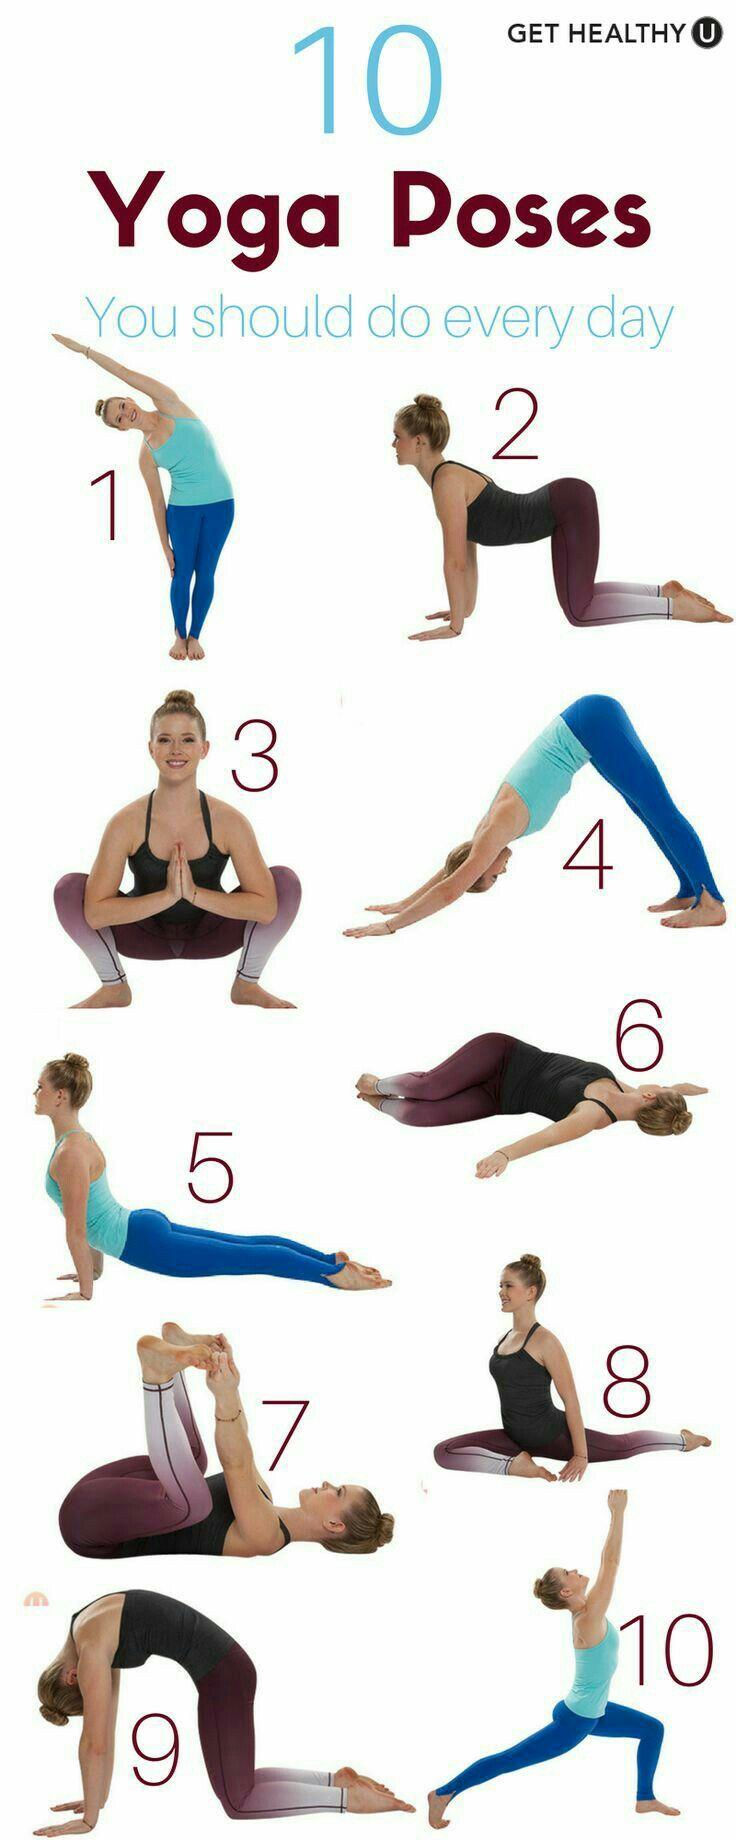 10 yoga poses you should do every day fit pinterest exercices yoga et entra nement. Black Bedroom Furniture Sets. Home Design Ideas